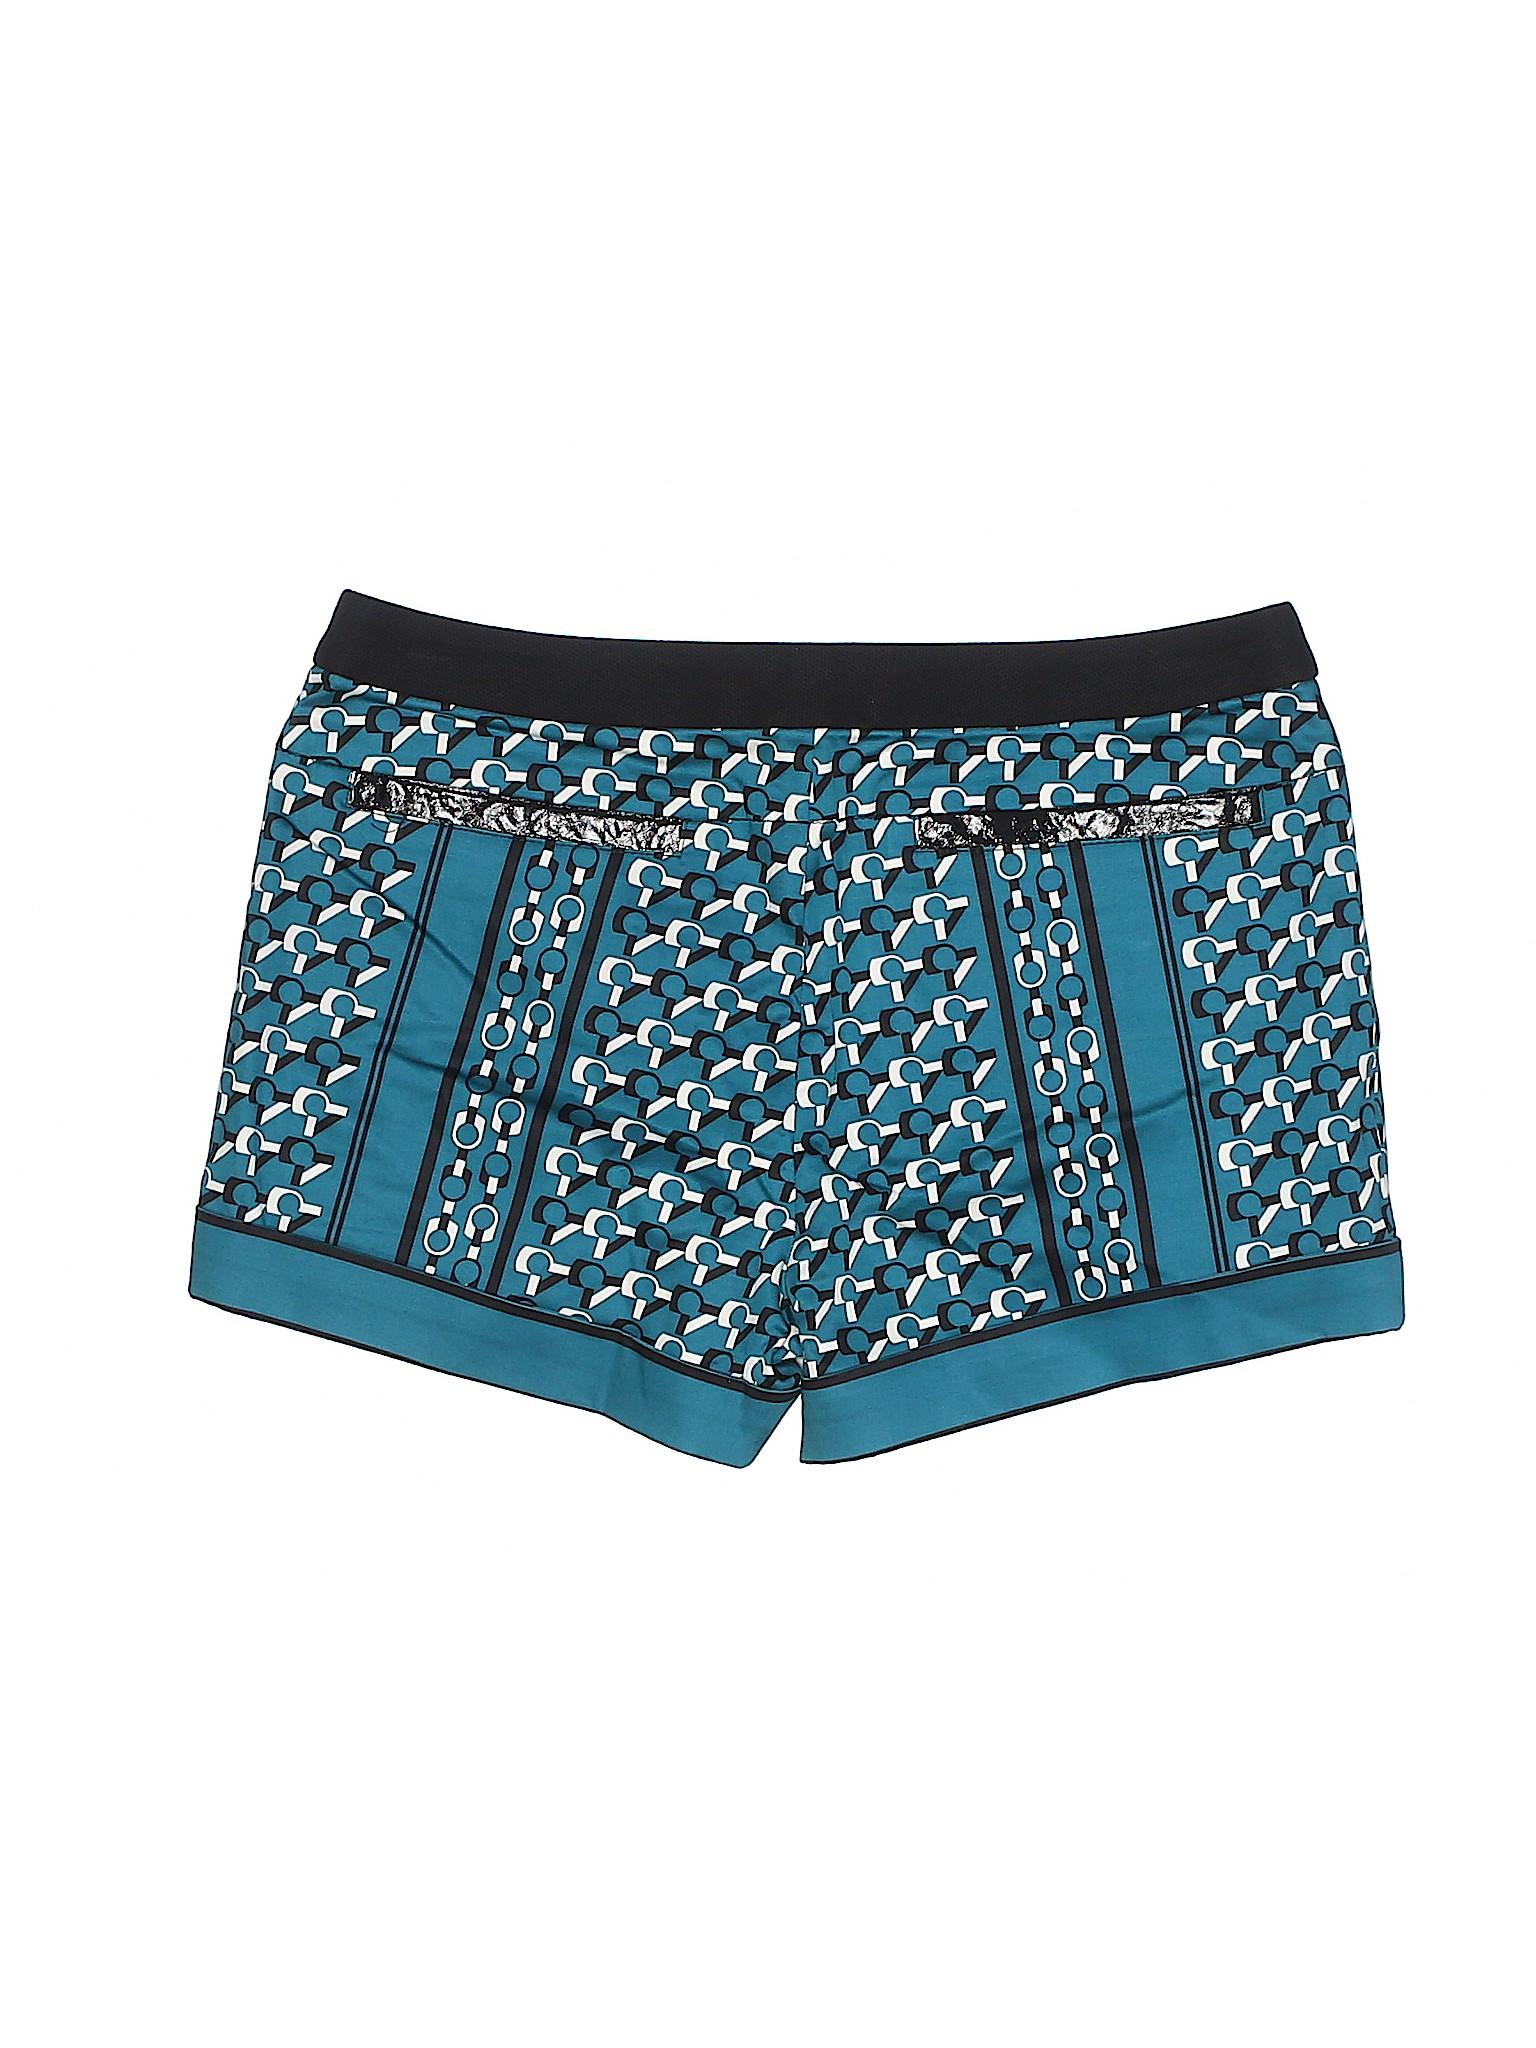 Dressy Derek Lam Boutique Shorts Crosby 10 gnFwxCS